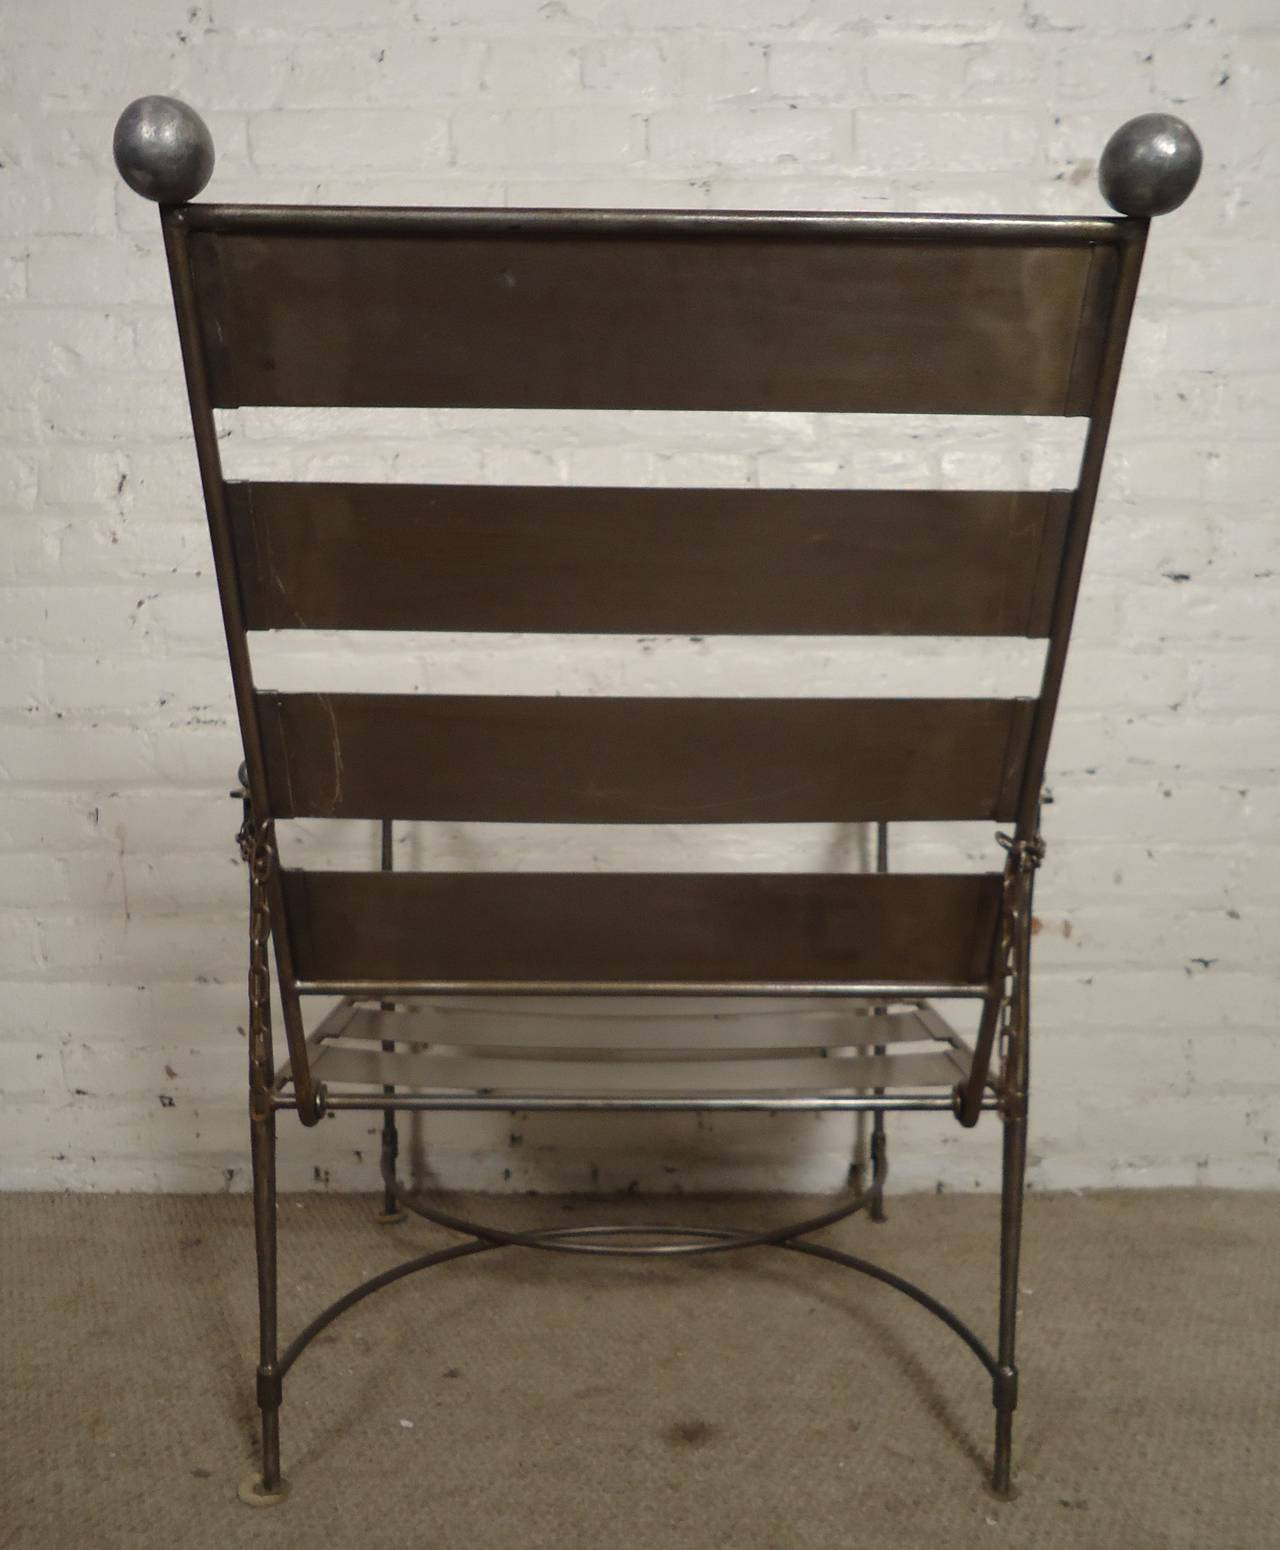 Unusual Pair Of Industrial Slatted Folding Metal Armchairs For Sale 1